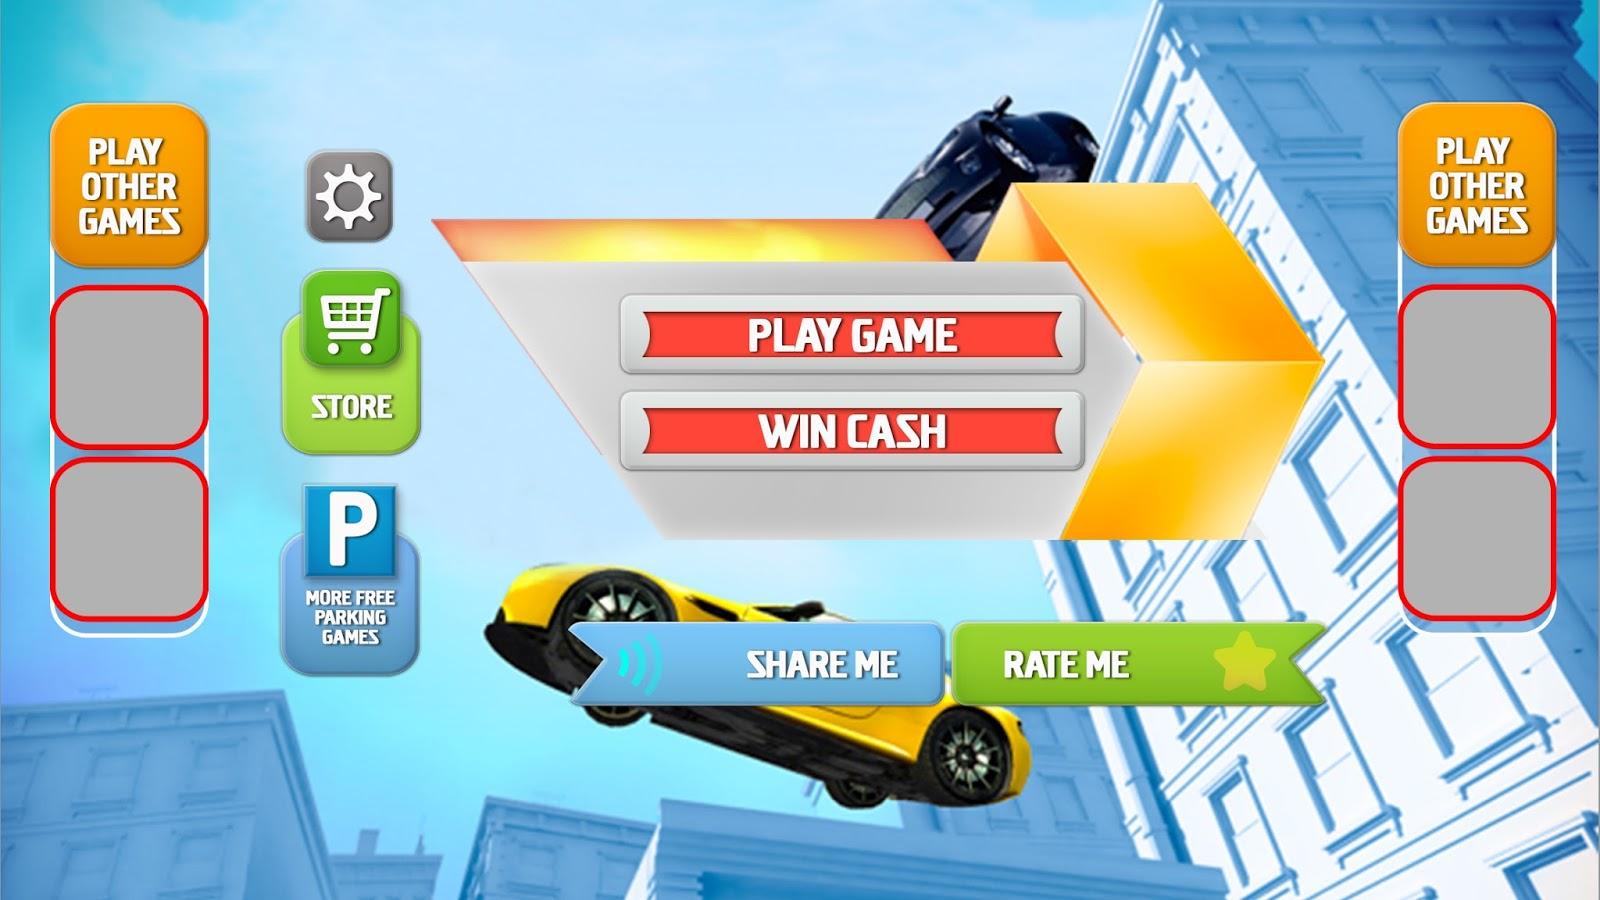 Game UI Design For Racing Game - Game ui design